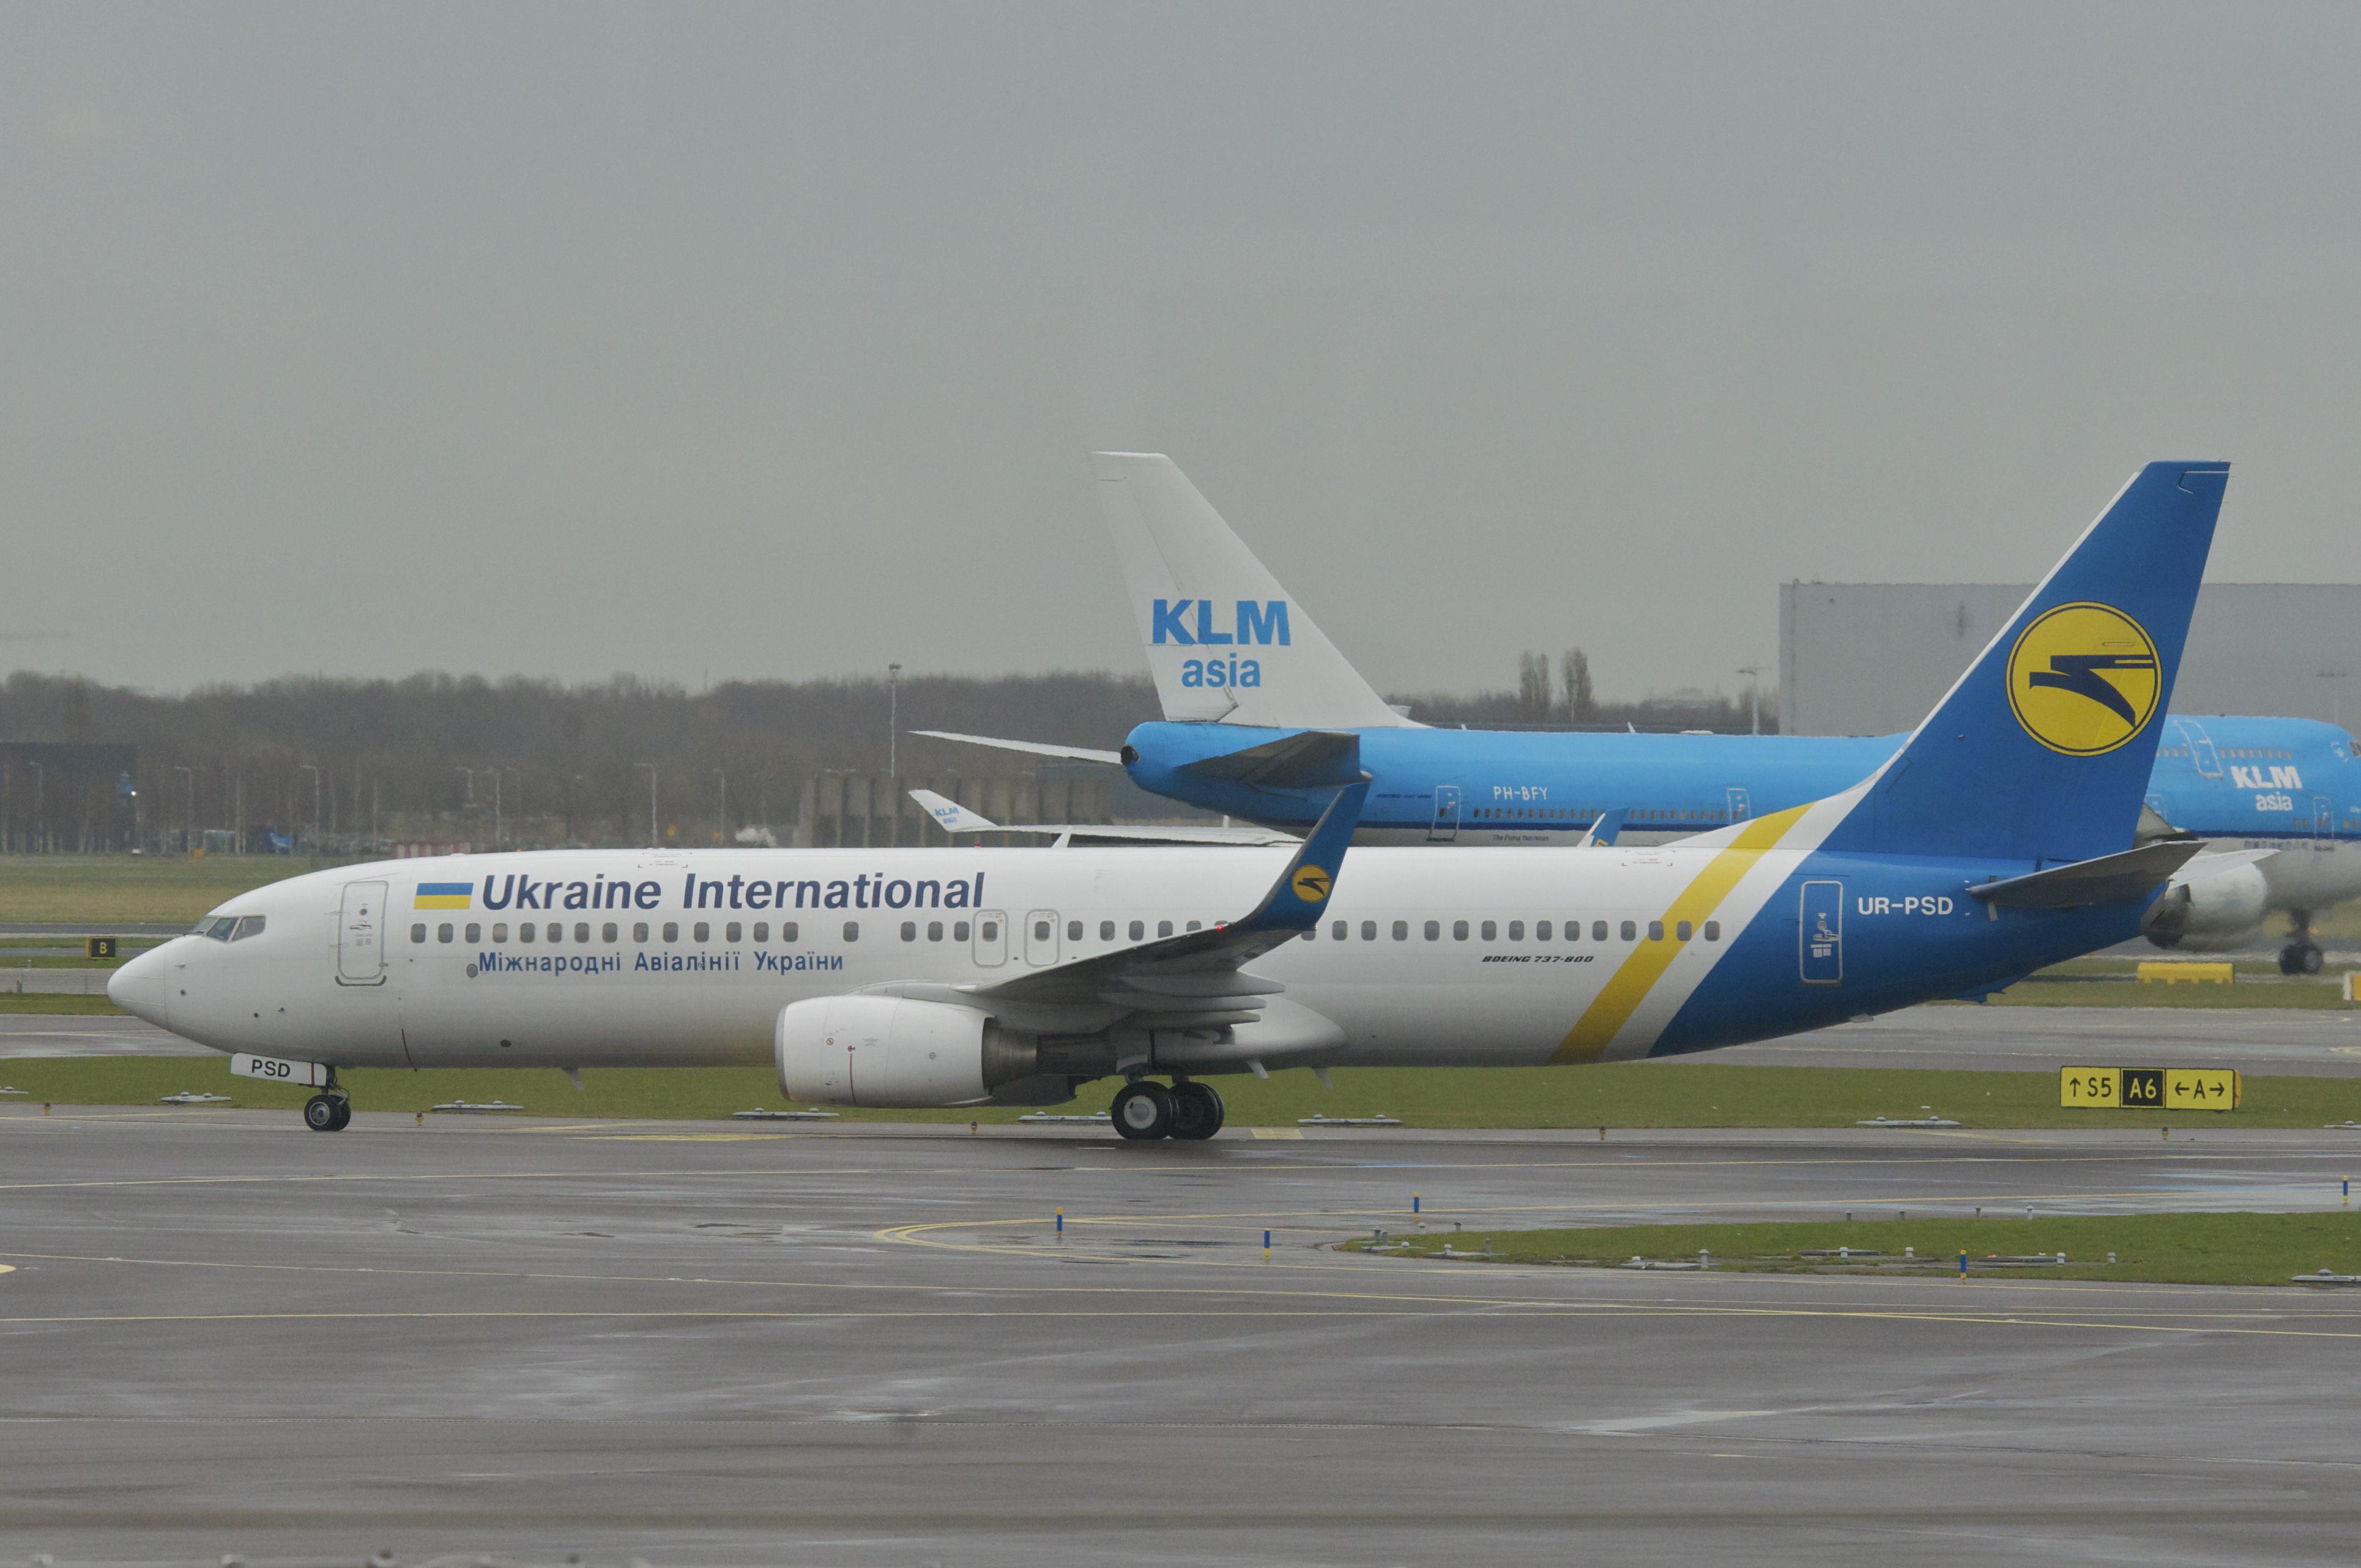 Fileukraine international airlines boeing 737 800 ur psdams fileukraine international airlines boeing 737 800 ur psdams publicscrutiny Images